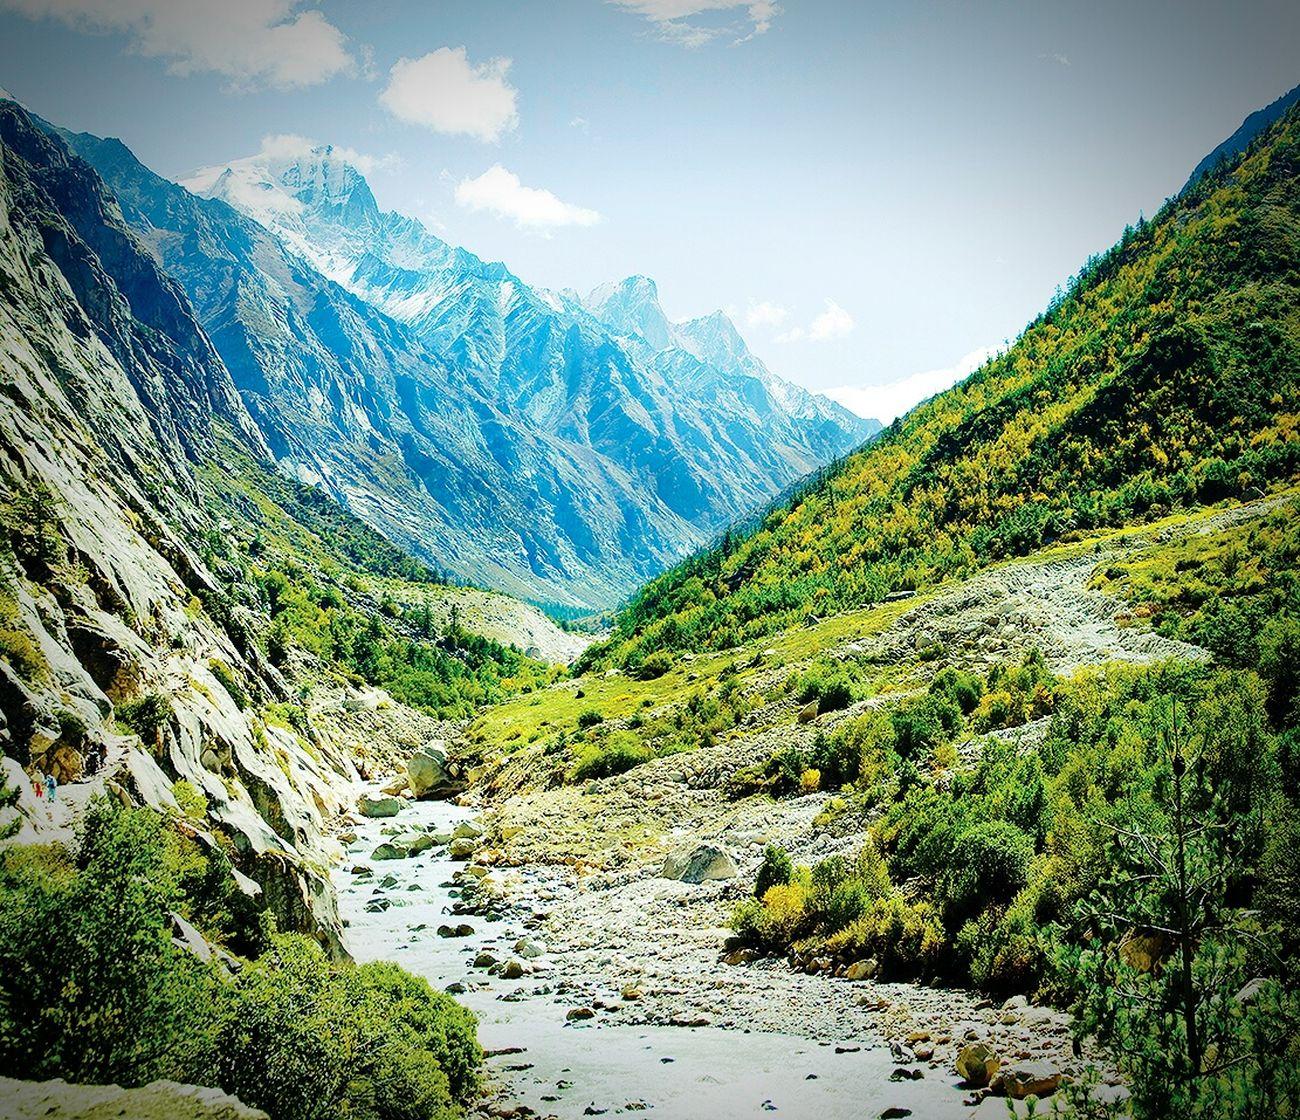 Gangotri panaramic Himalayas Mountain Himalayas Himalayan Range HimalayaScape Gangotri Panaramic First Eyeem Photo